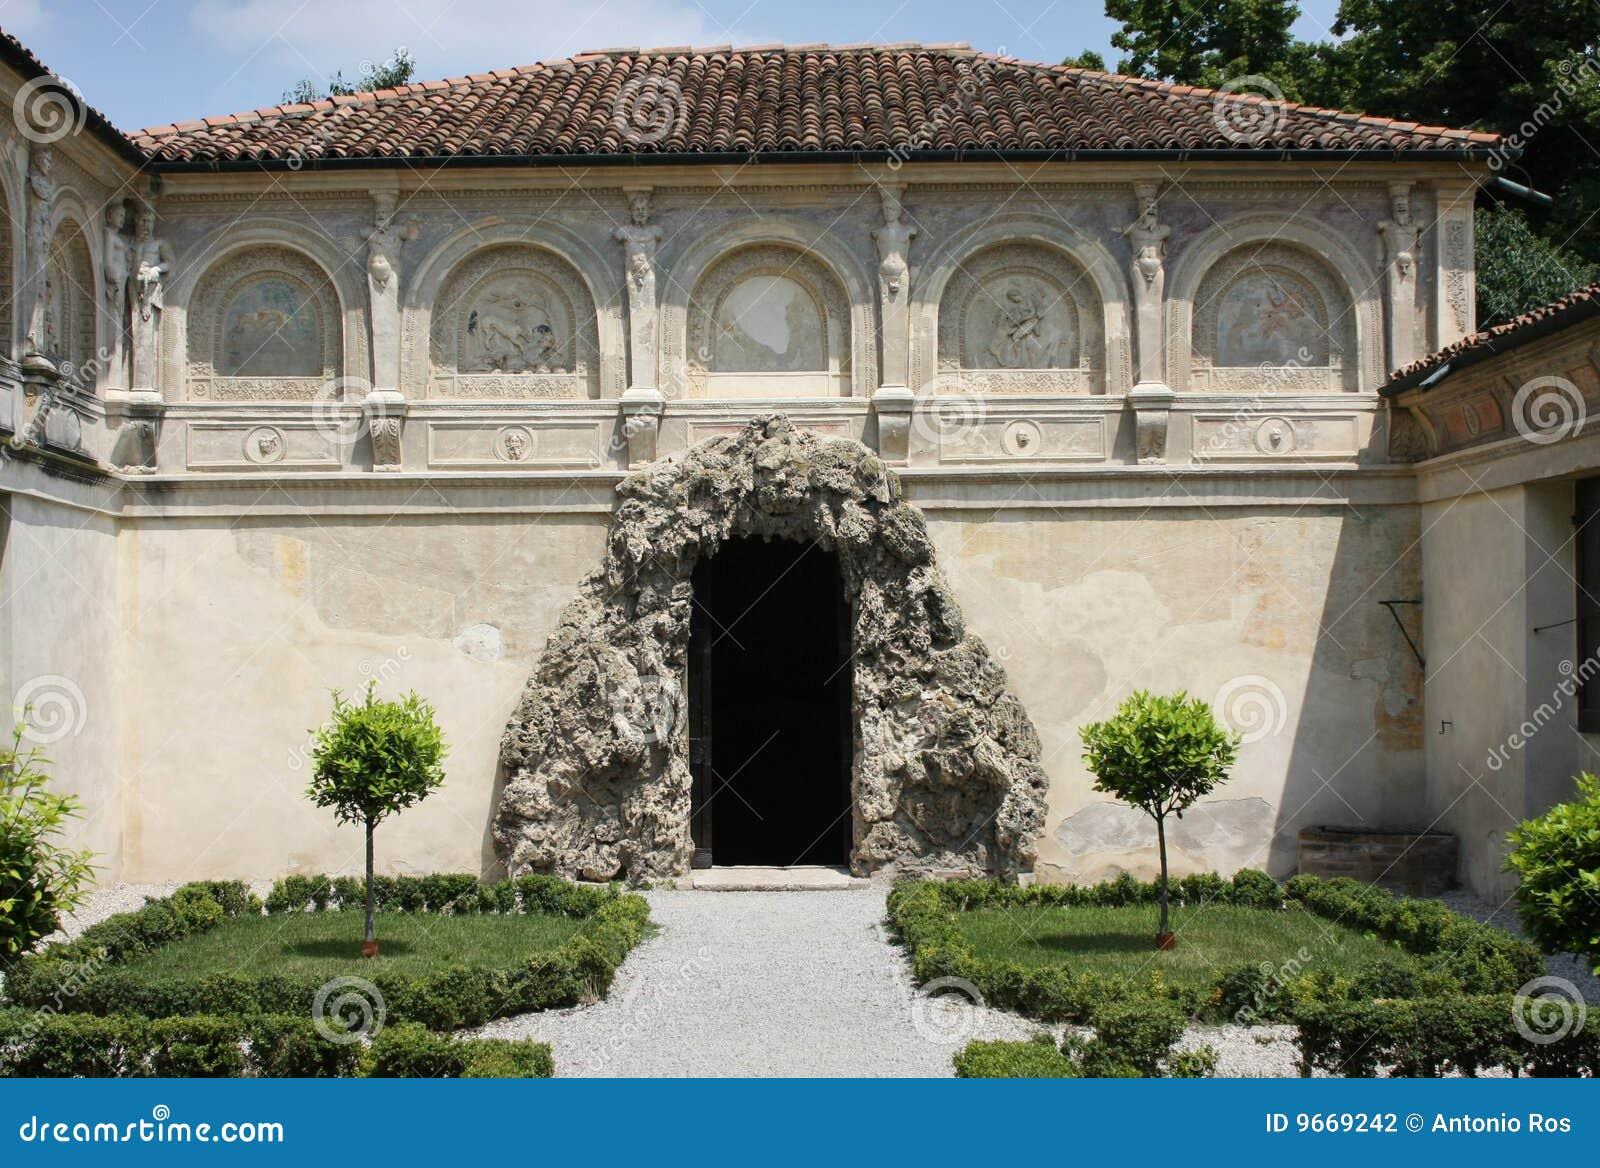 Palazzo te mantova italy the grotto stock photography - Giardino del te ...